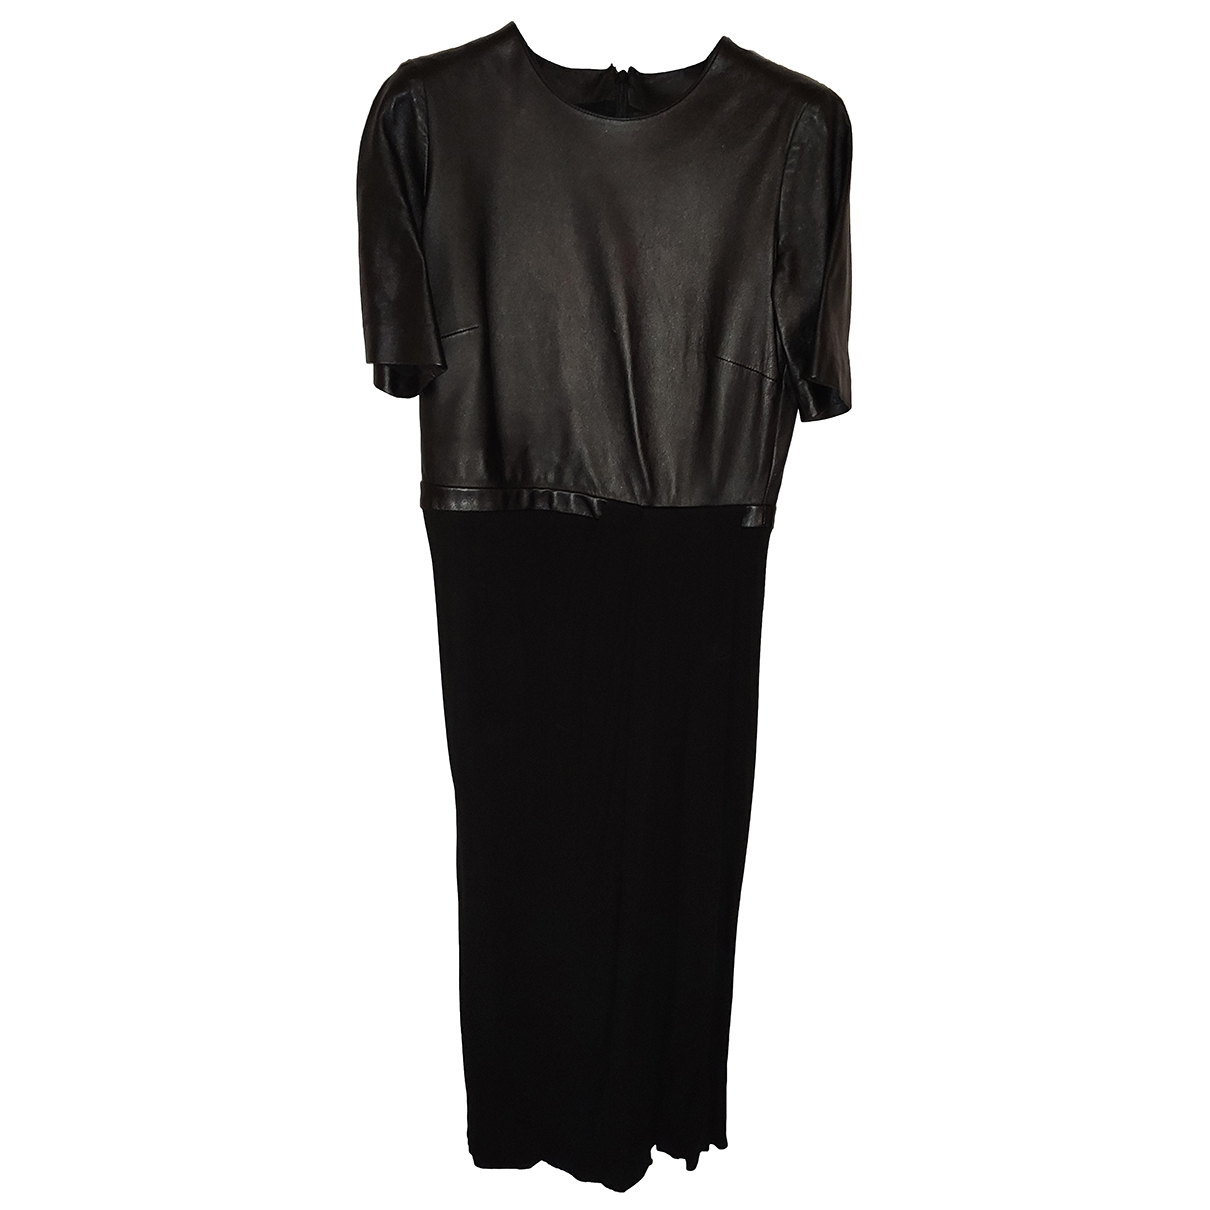 Gucci \N Black Leather dress for Women XS International